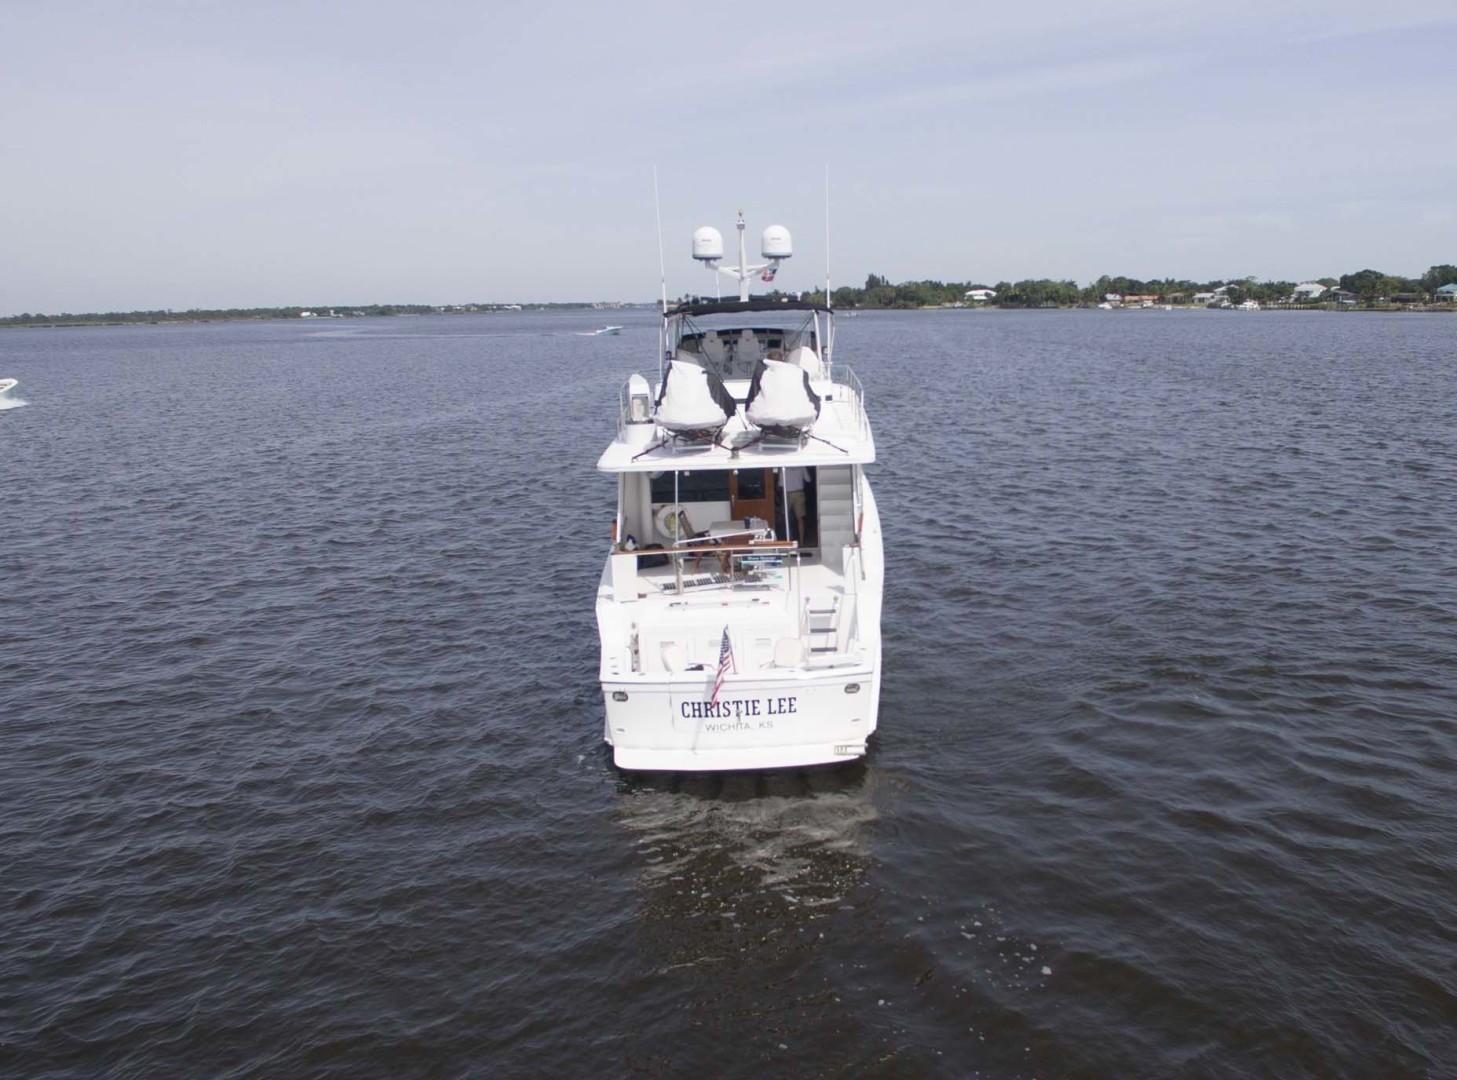 Hatteras-Motoryacht 1987-Christie Lee Stuart-Florida-United States-Stern View-1392662   Thumbnail